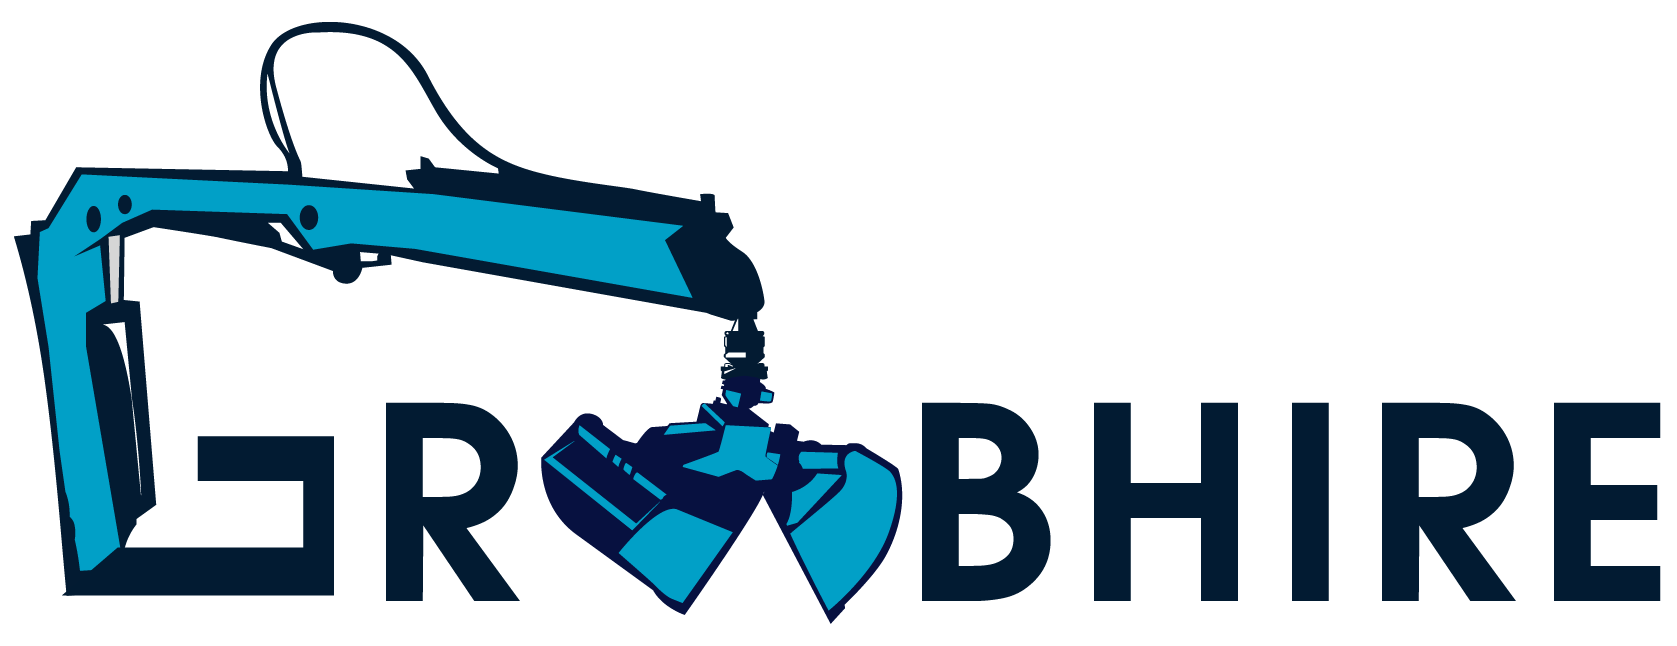 Grab Hire Logo